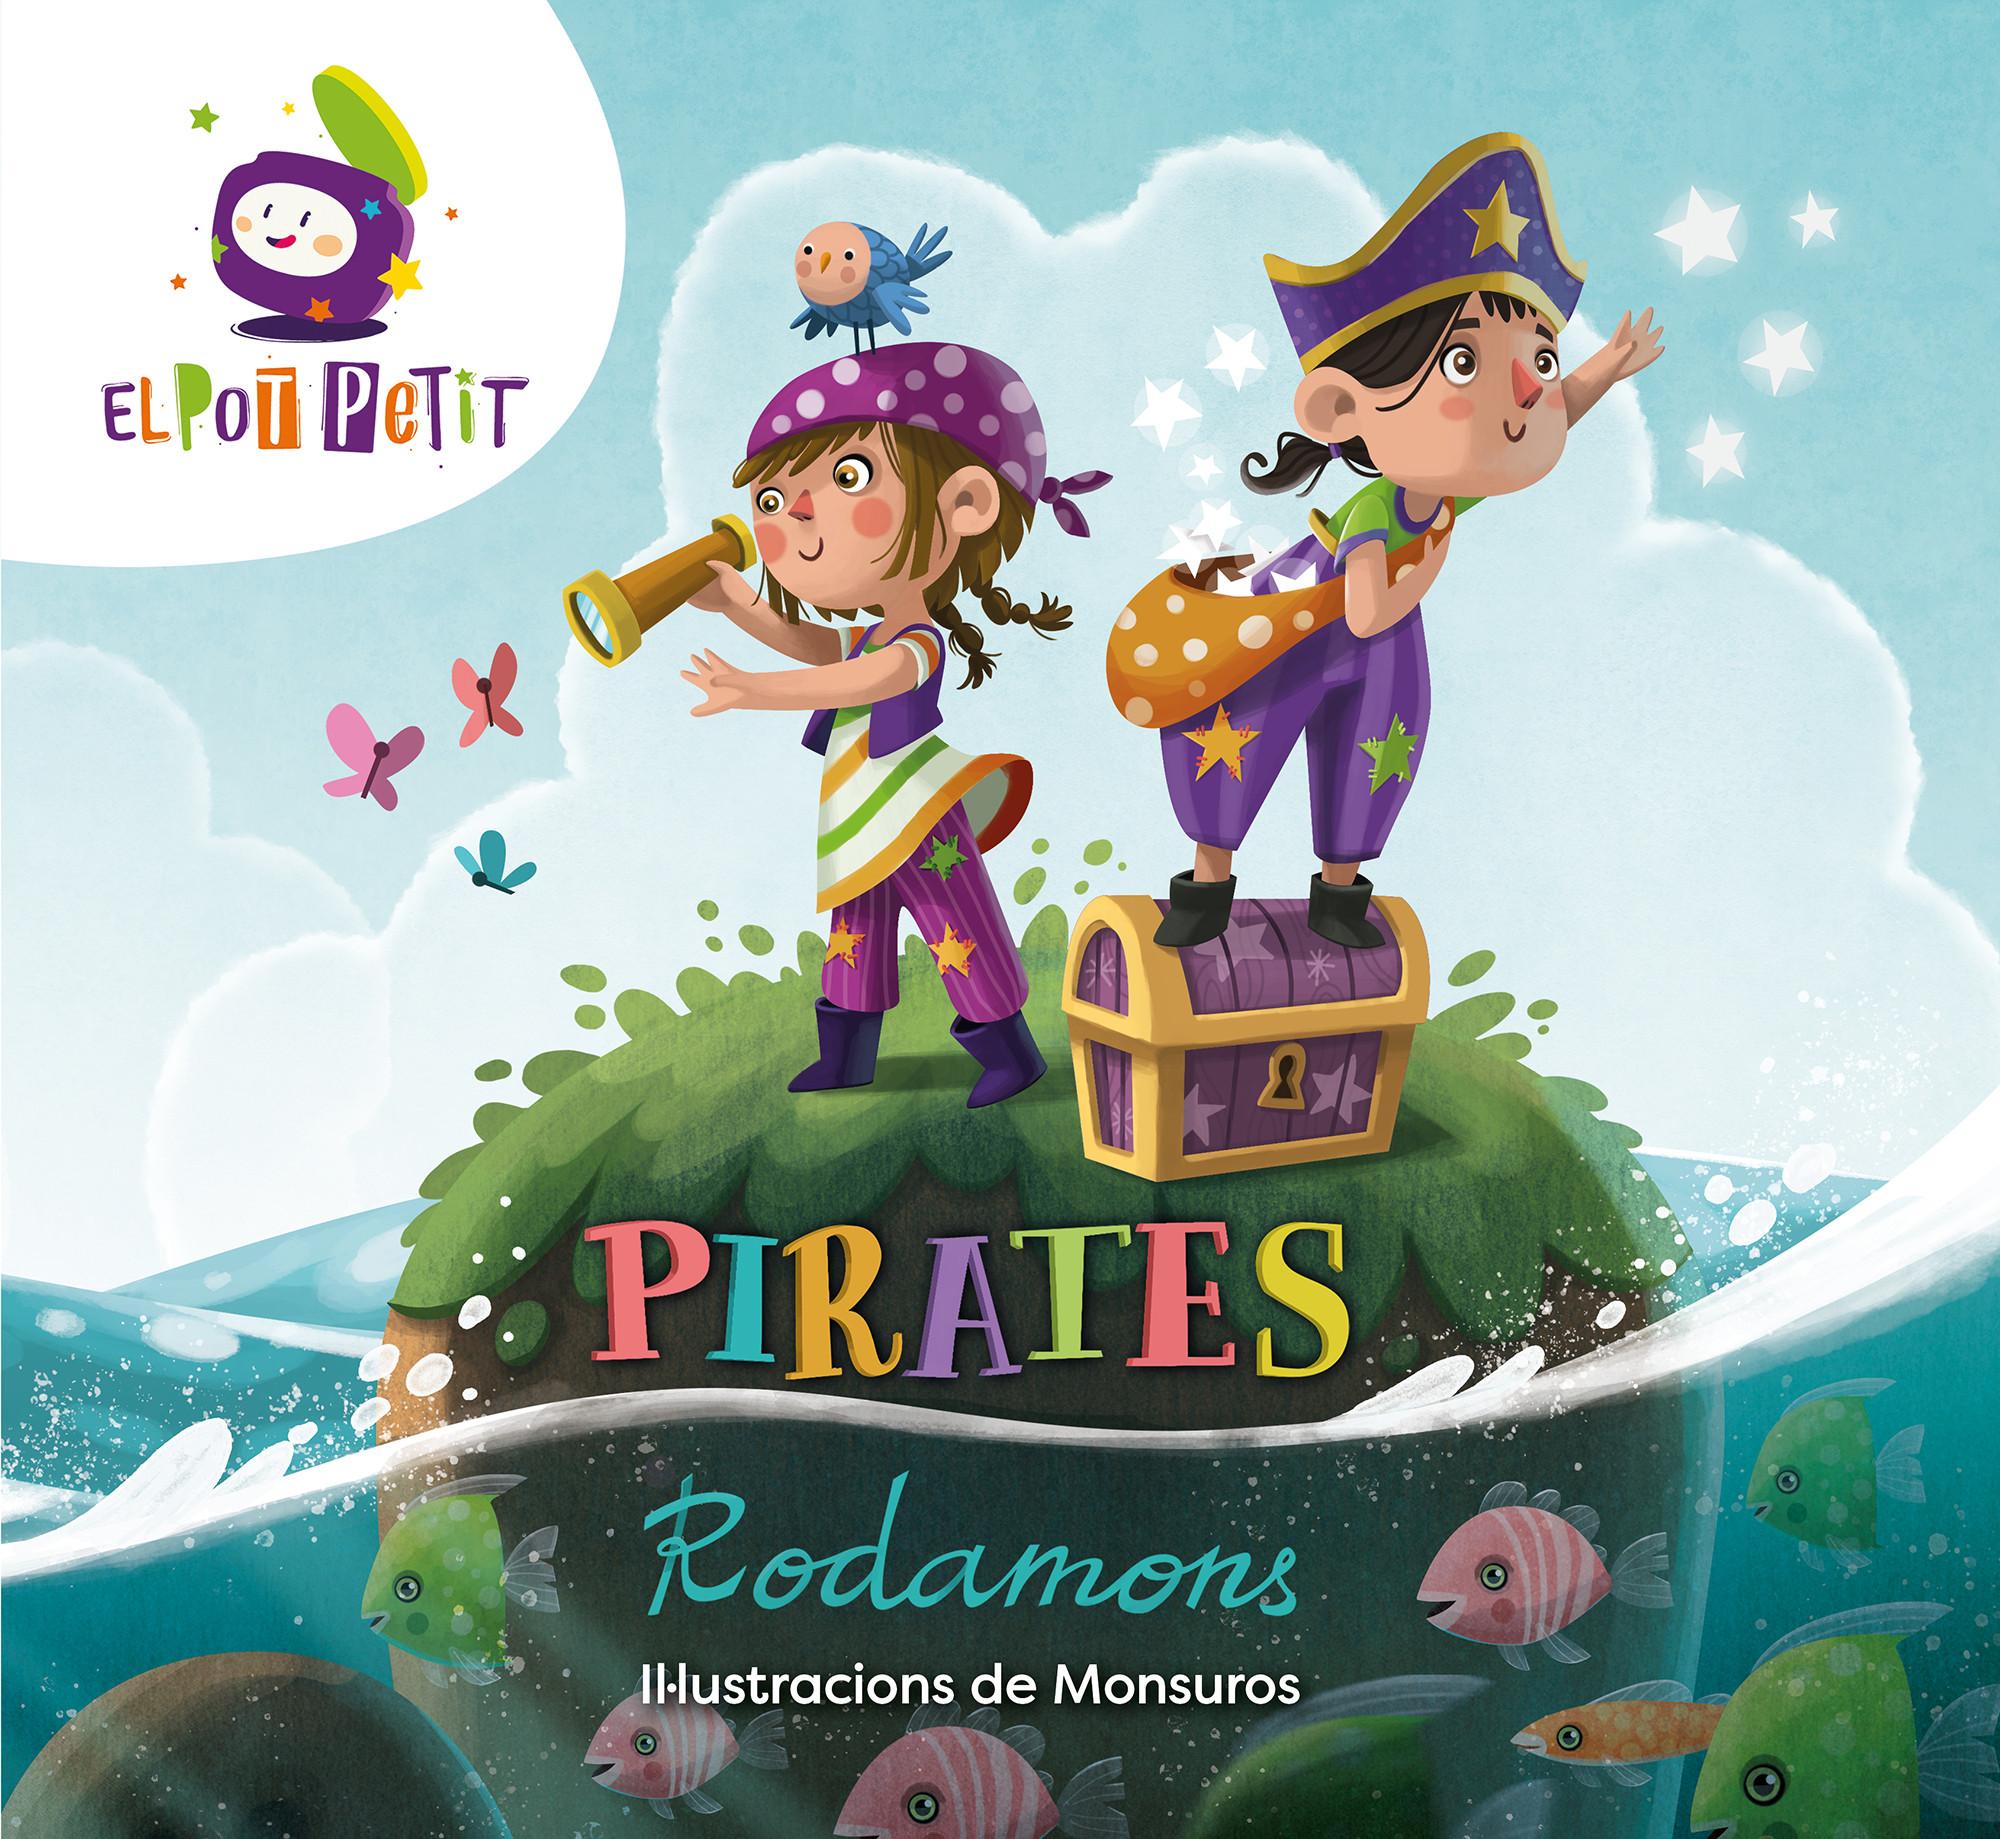 Pirates Rodamons